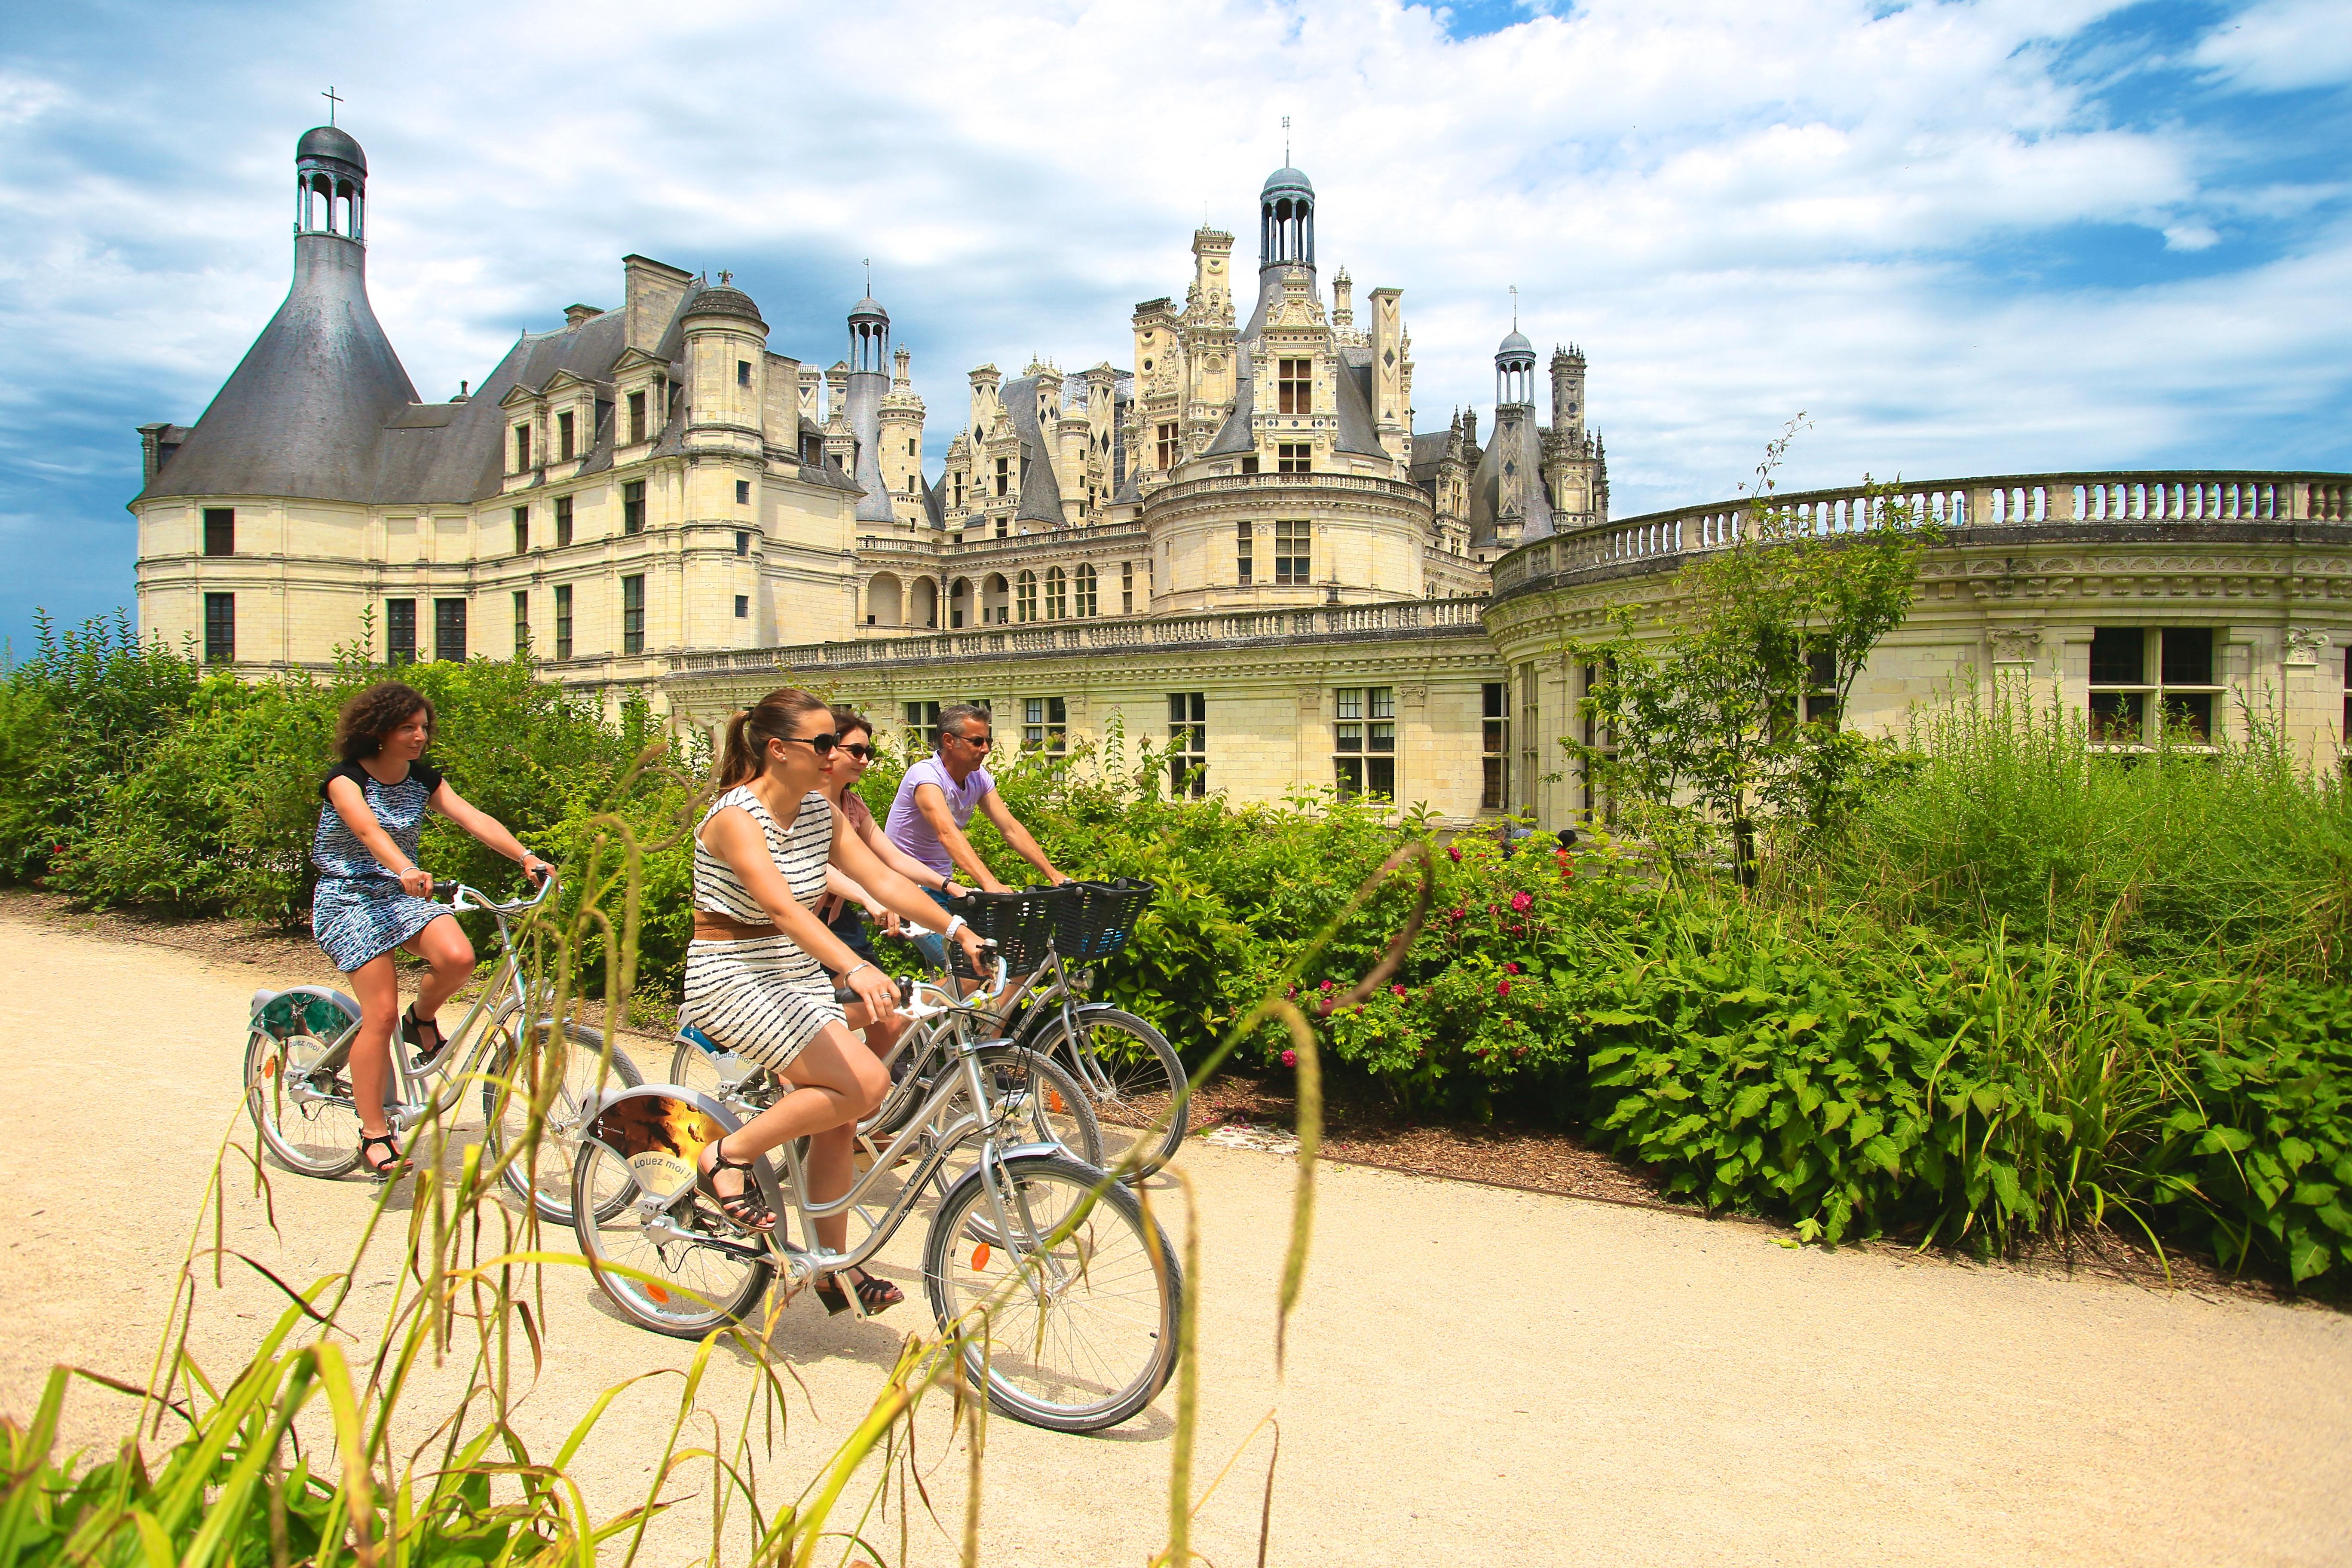 Circuits cyclotouristiques à Chambord